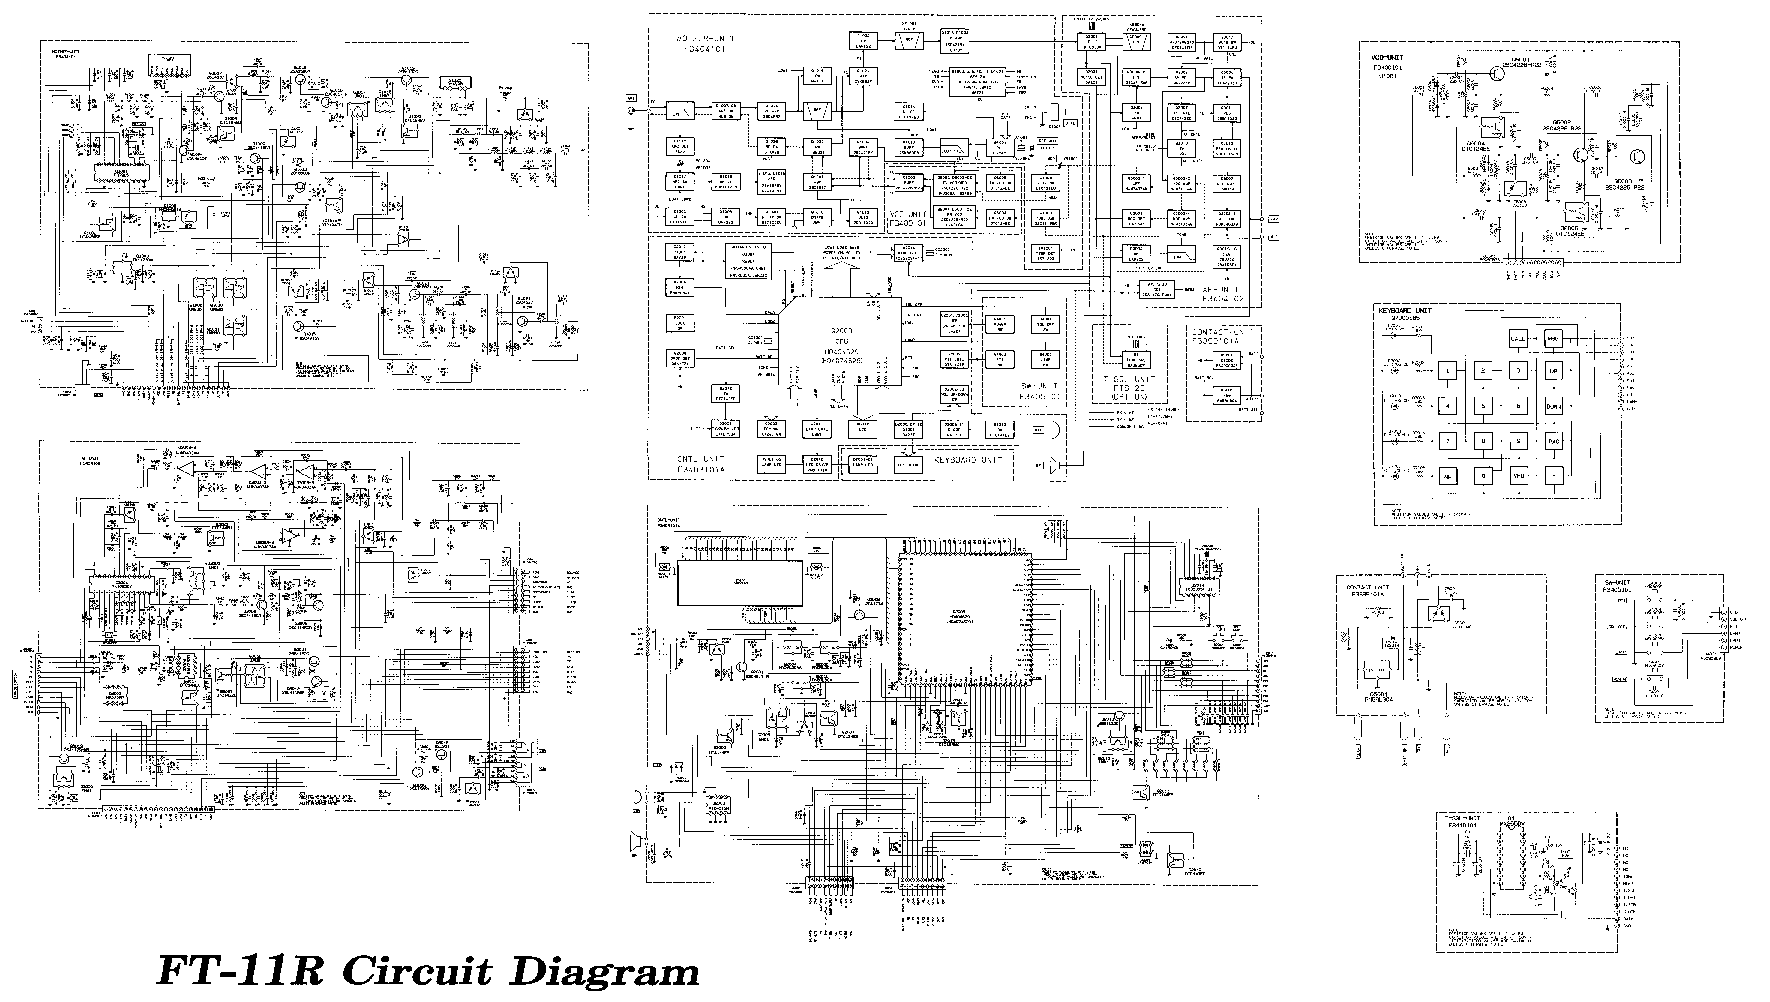 Ft 847 service manual pdf